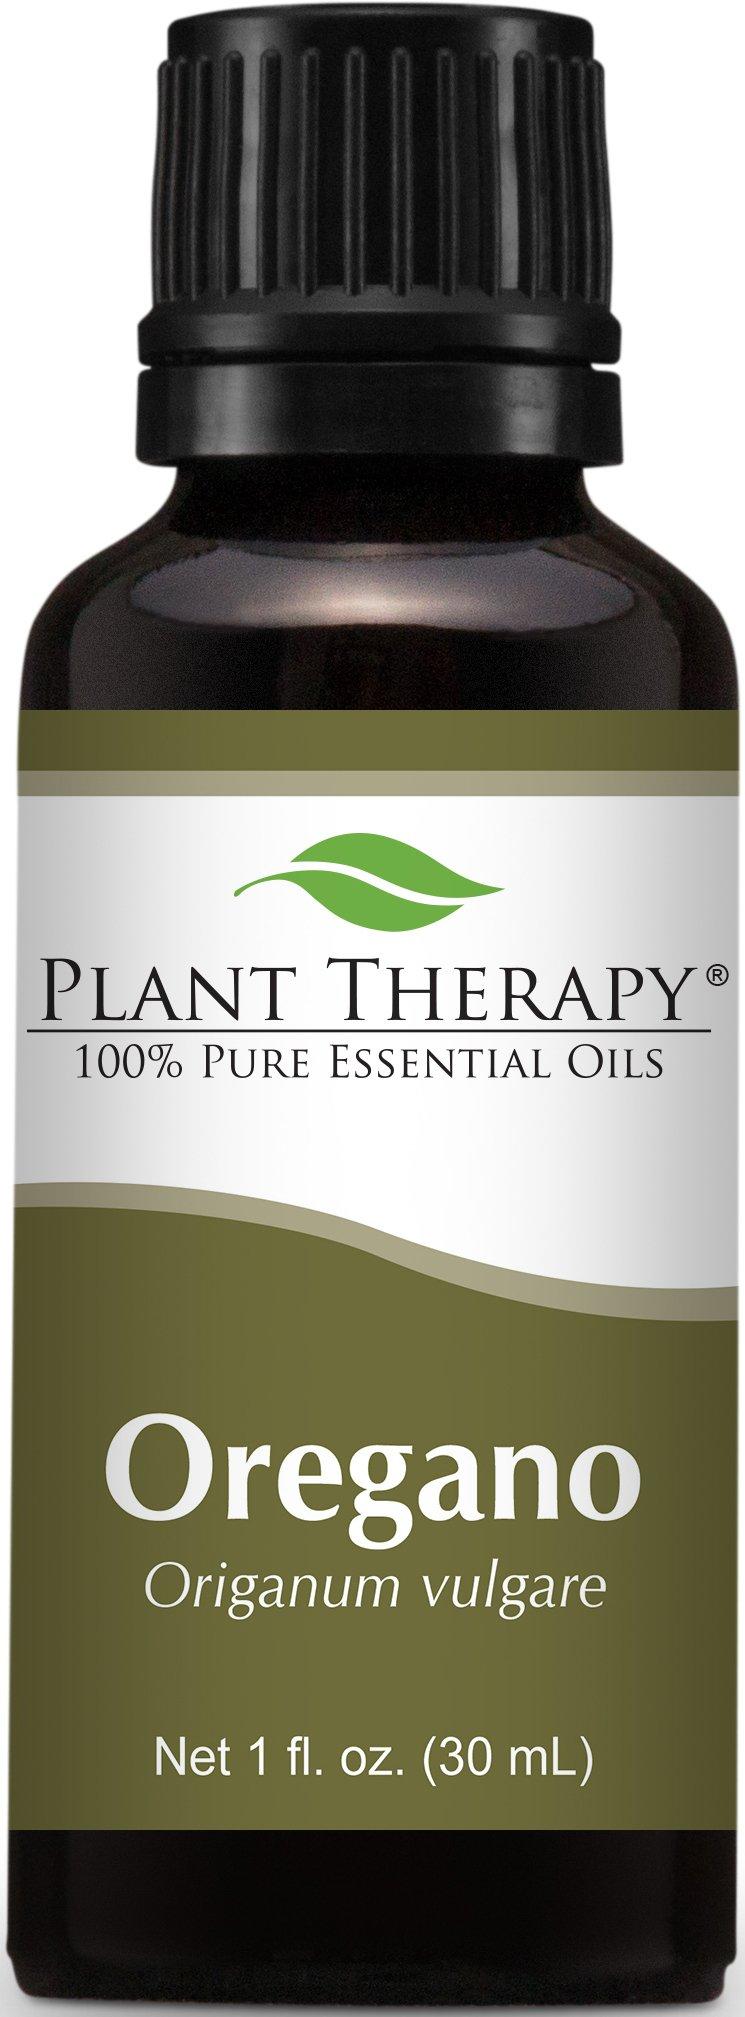 Plant Therapy Oregano (Origanum) Essential Oil. 100% Pure, Undiluted, Therapeutic Grade. 30 ml (1 oz).